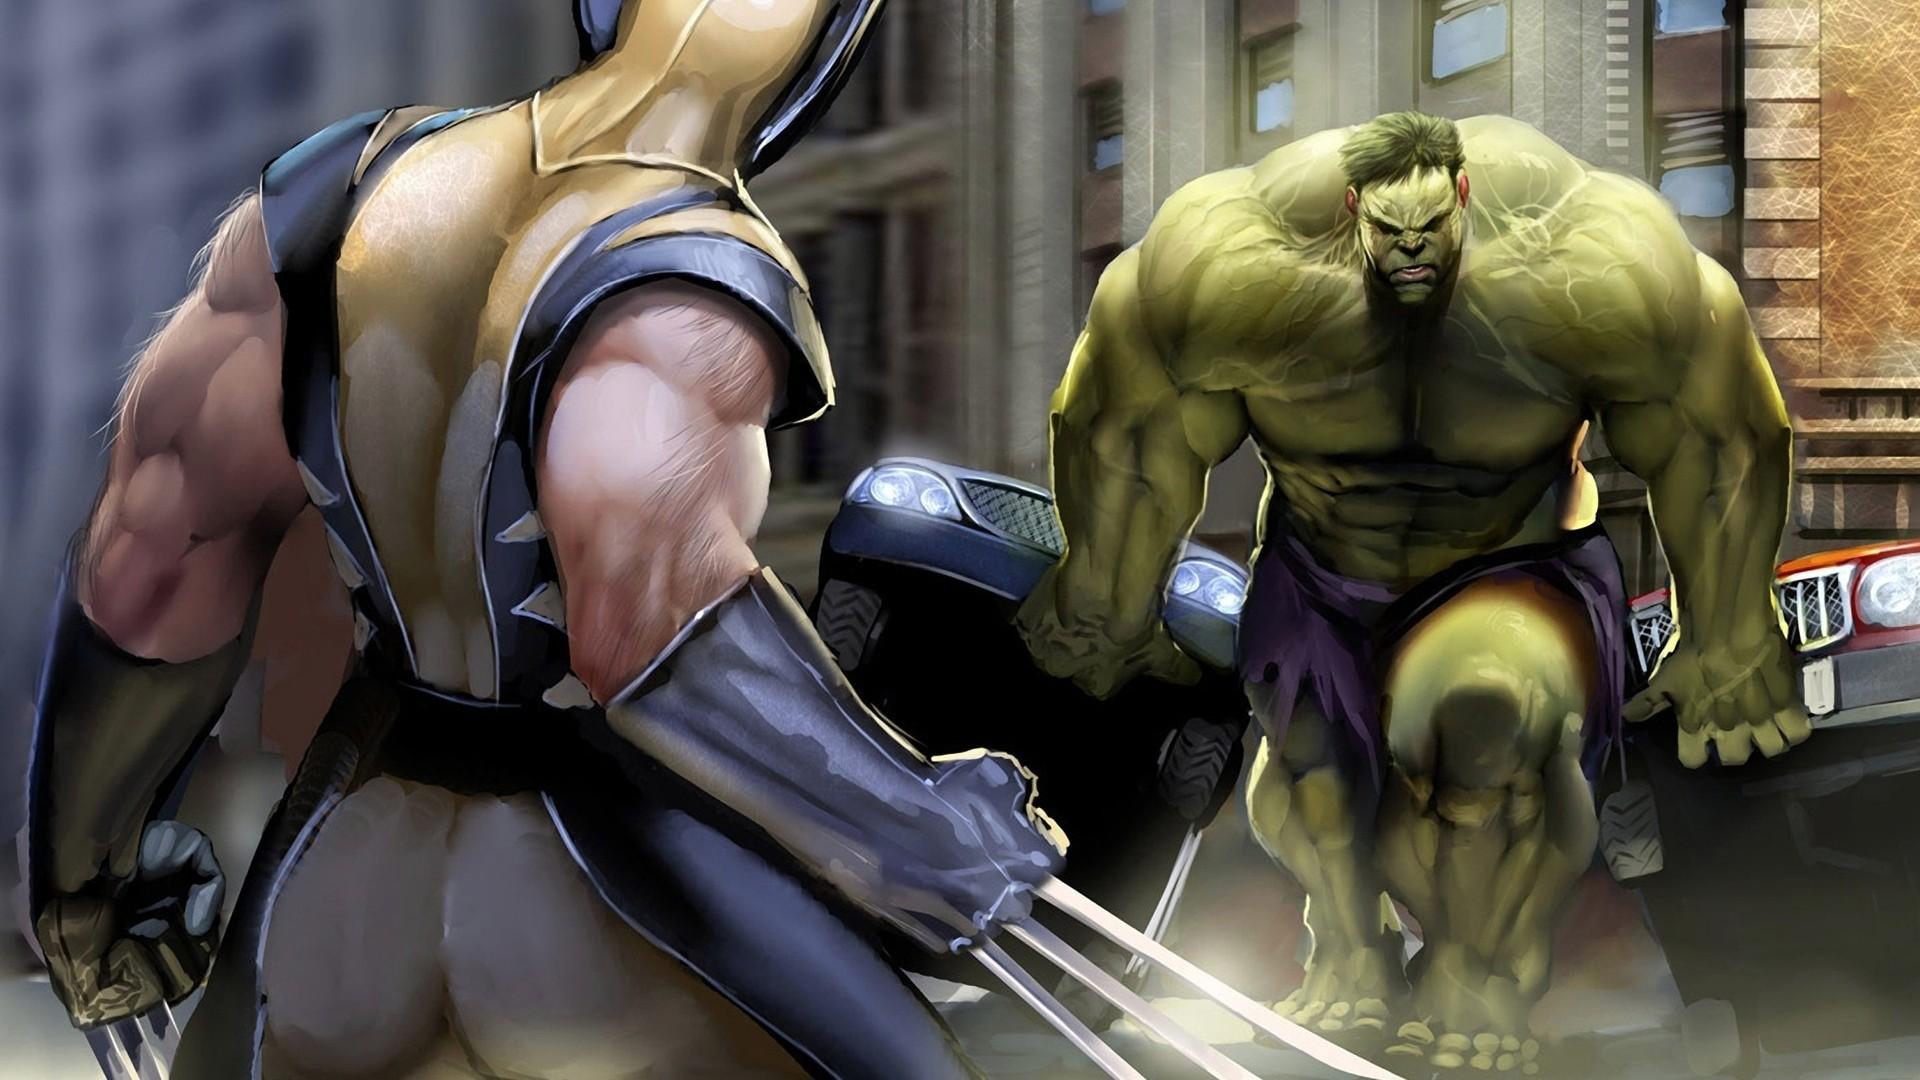 Res: 1920x1080, Hulk vs Wolverine, Marvel comics: